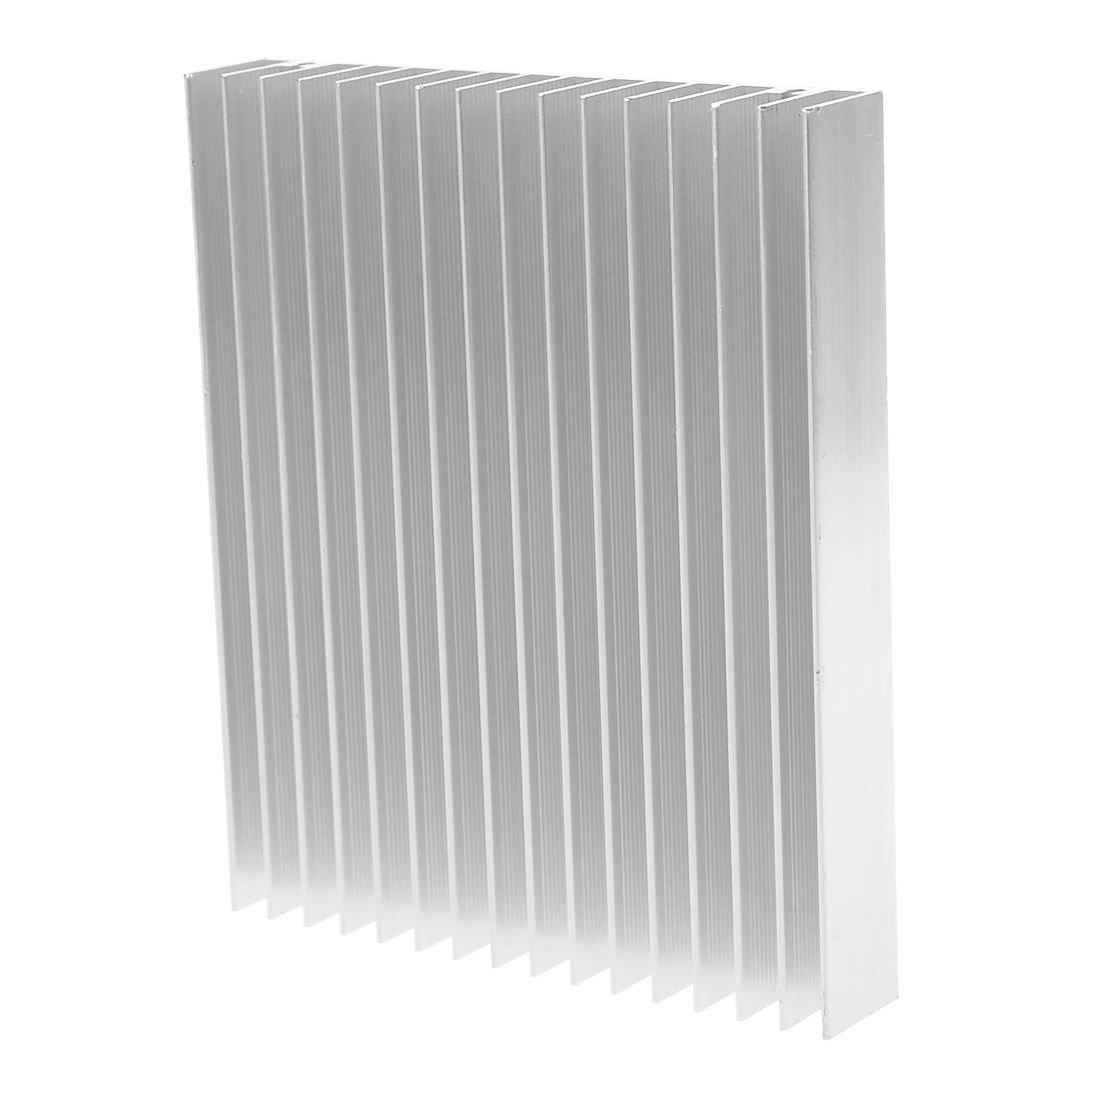 NA Aluminum Radiator Heatsink Diffuse heatsink Cooling fin 120x100x18mm